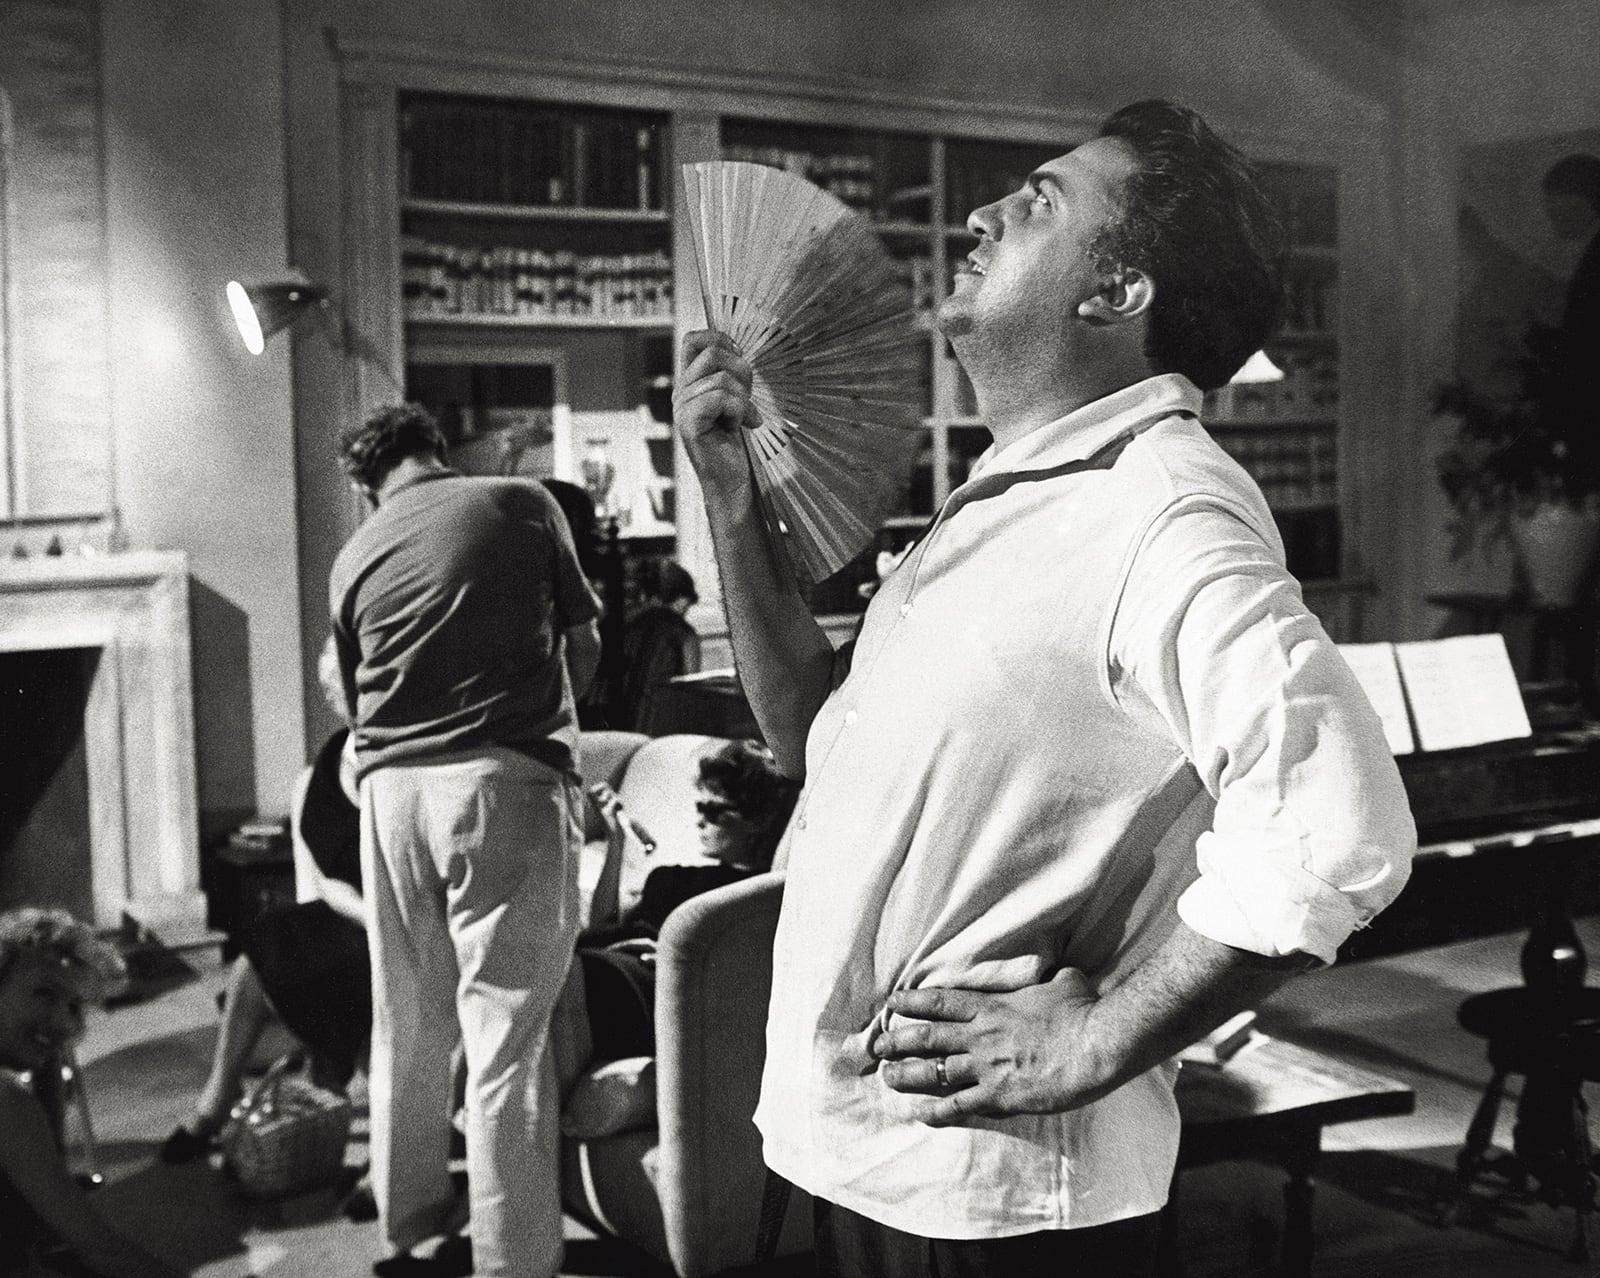 Federico Fellini en un descans del rodatge de La dolce vita, el 1959. Fotografia de Pierluigi Praturlon. Reporters Associati/Mondadori. Getty Images.